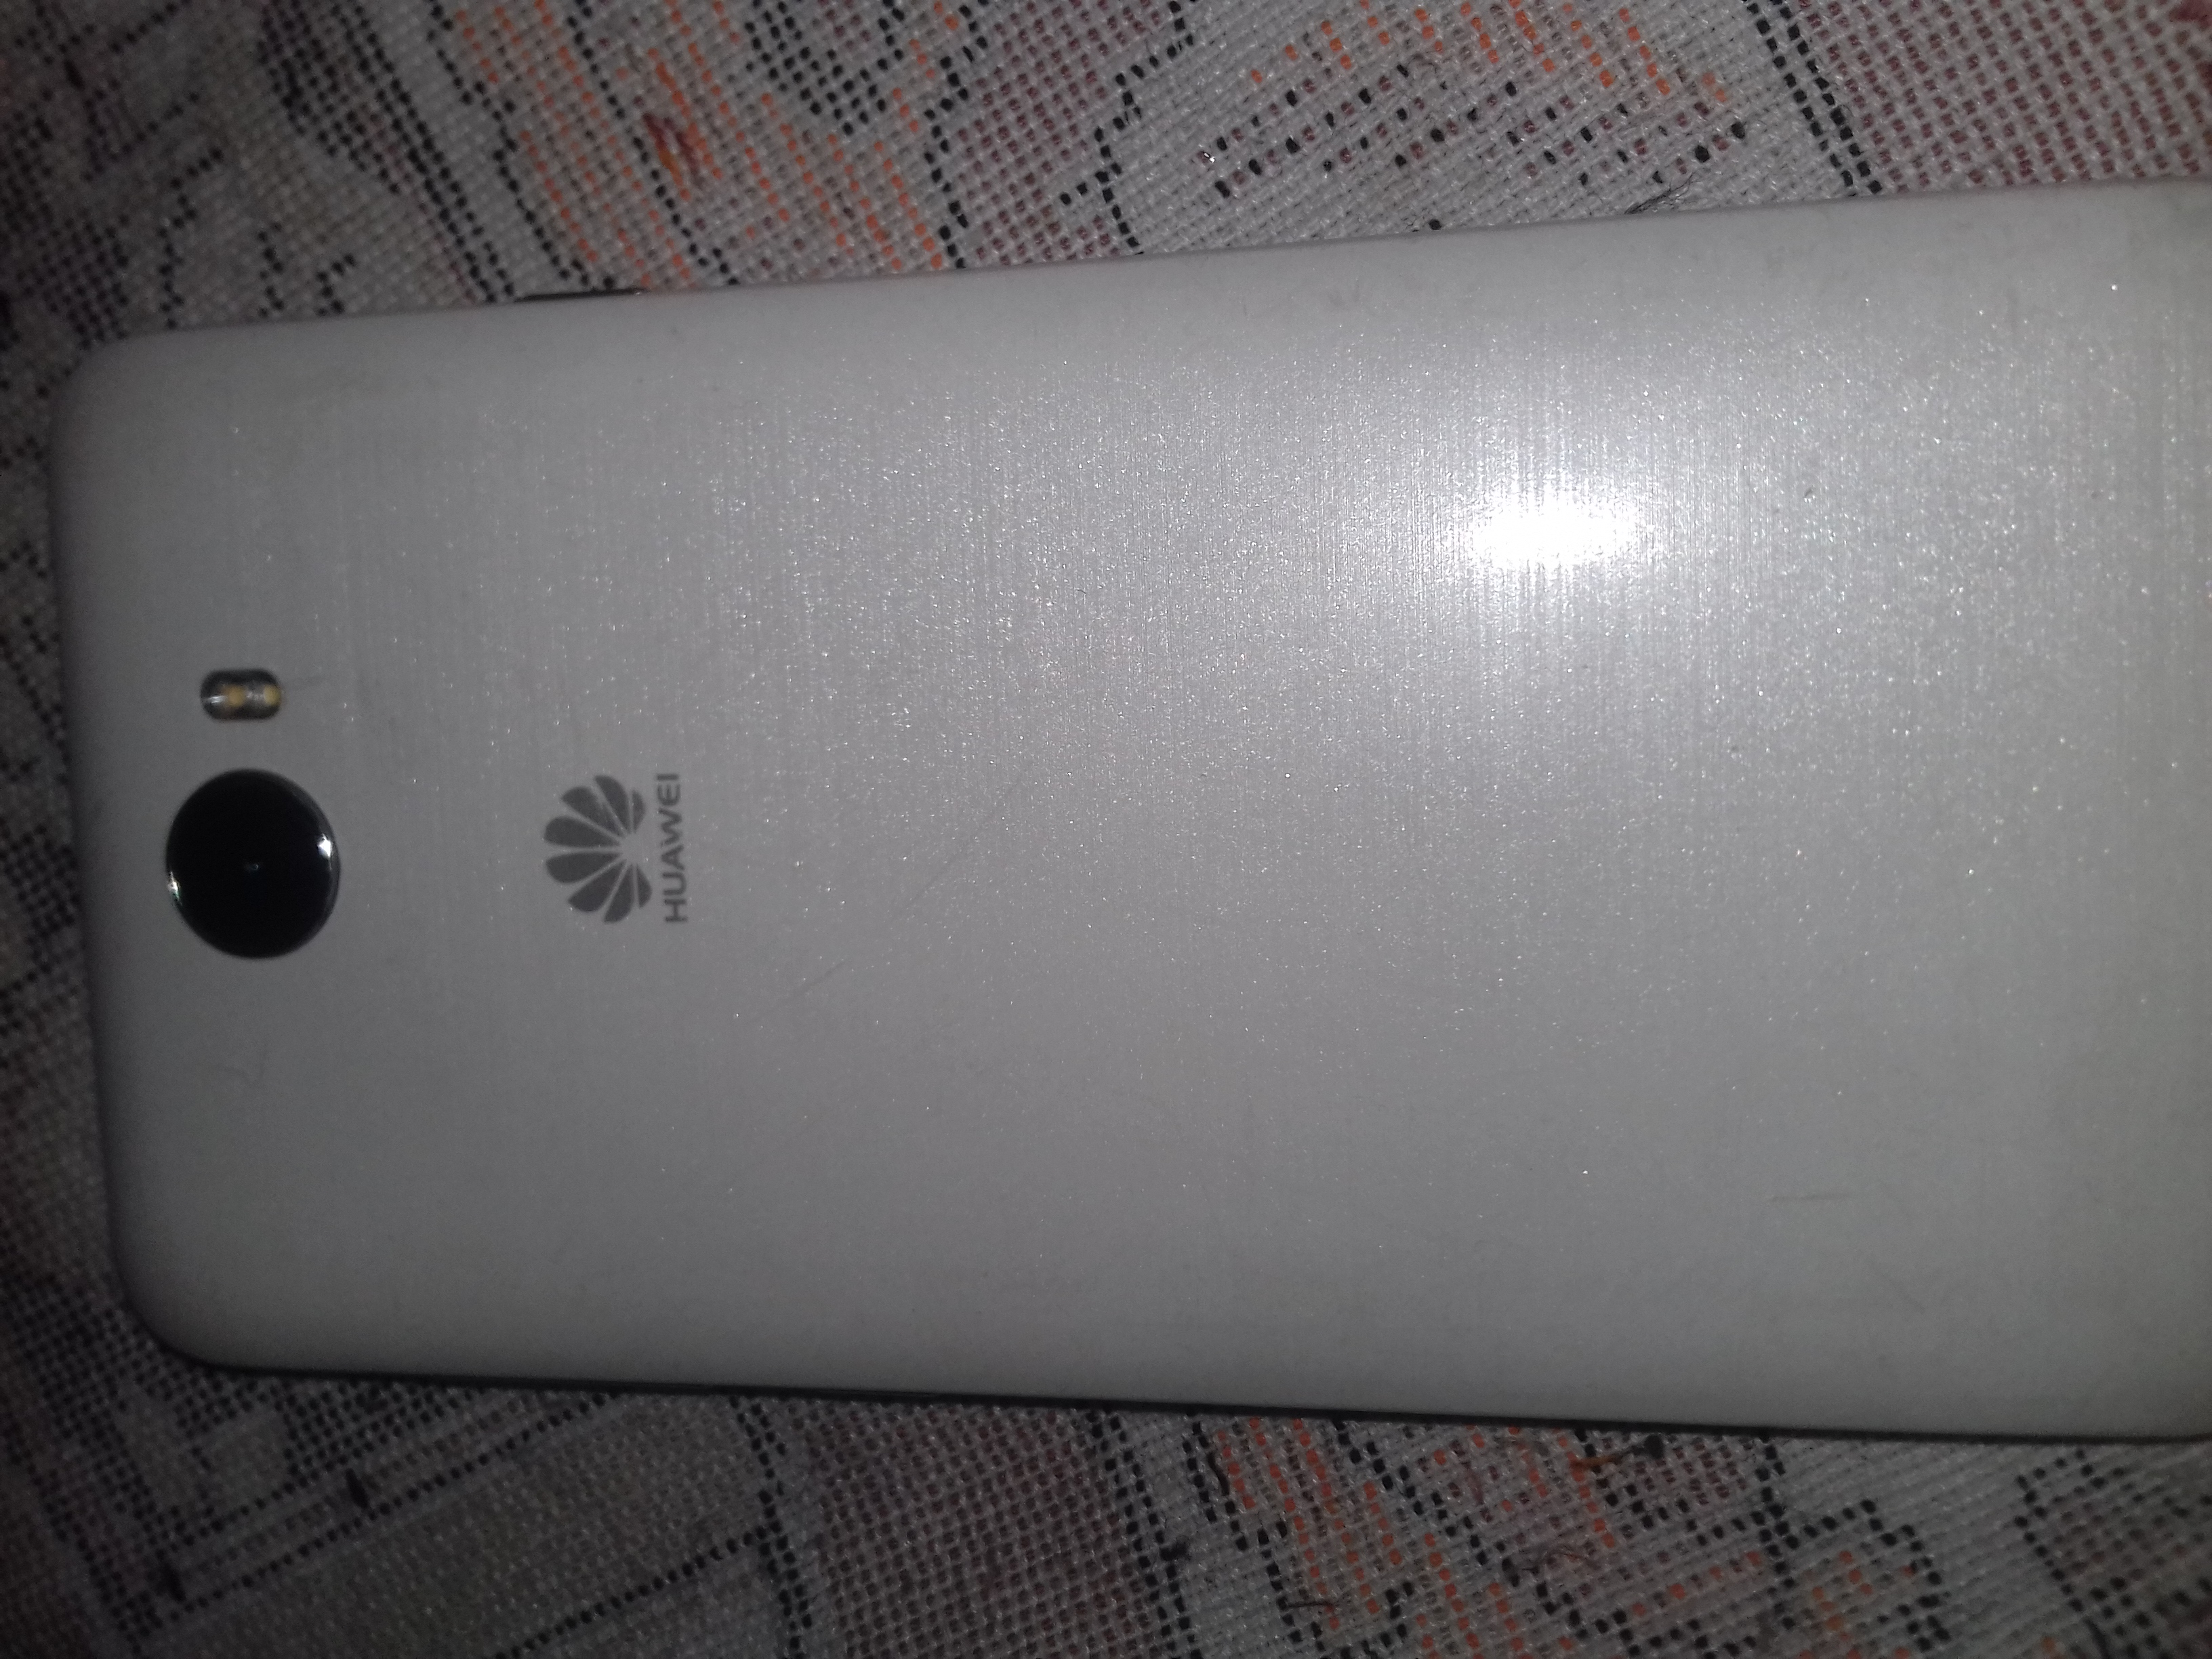 iphone 11 pro max 256GB-  هاتف هواوي بحاله جيدا جدا...